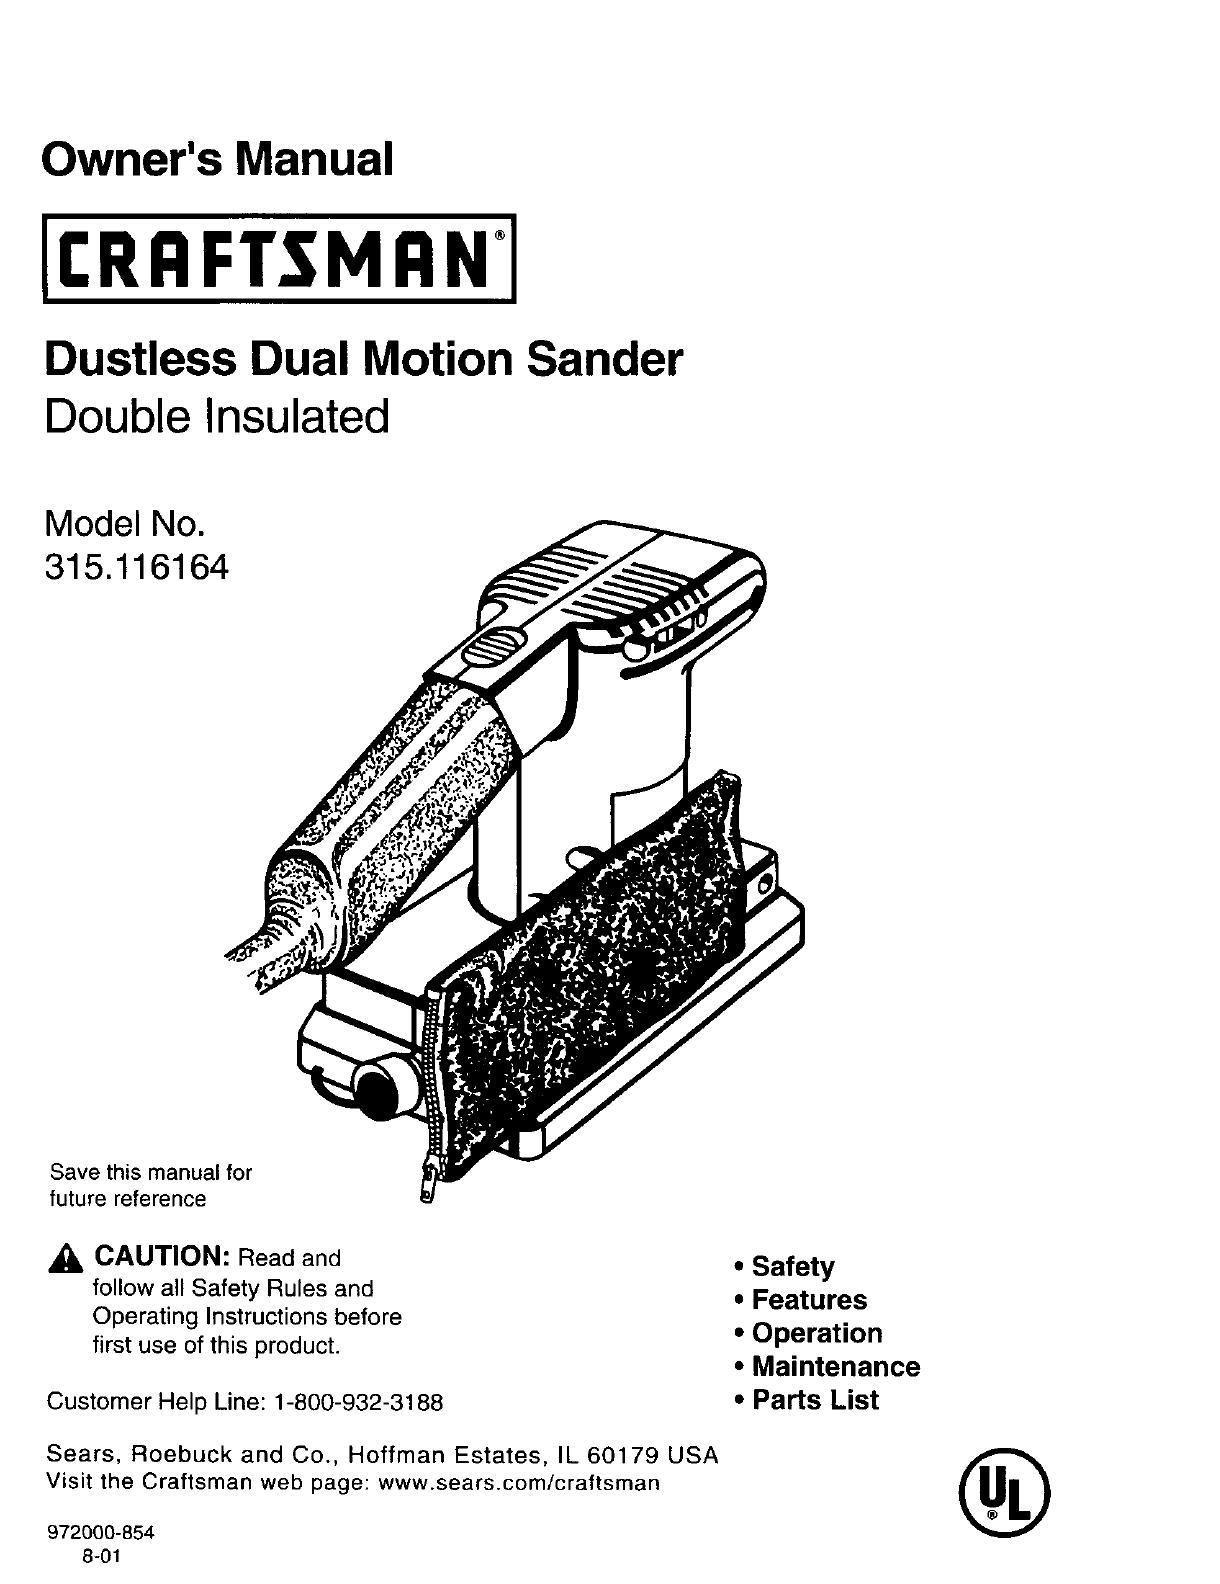 Craftsman 315116164 User Manual SANDER Manuals And Guides